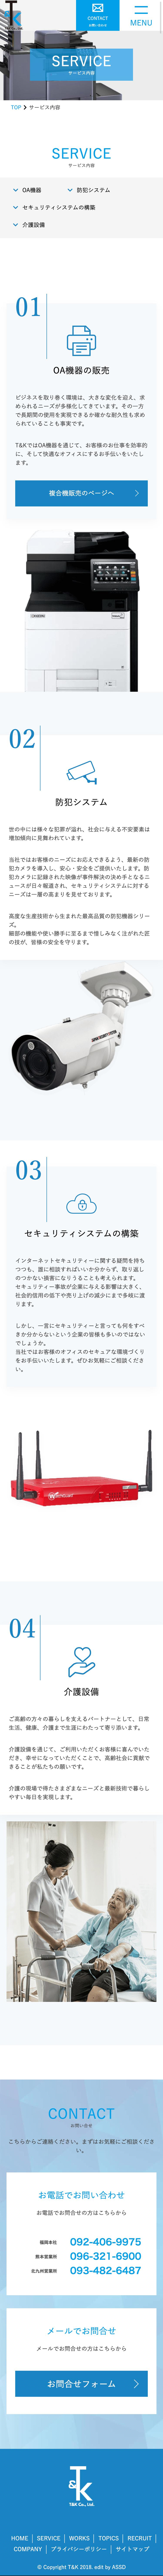 T&K株式会社様 ホームページ SP画像